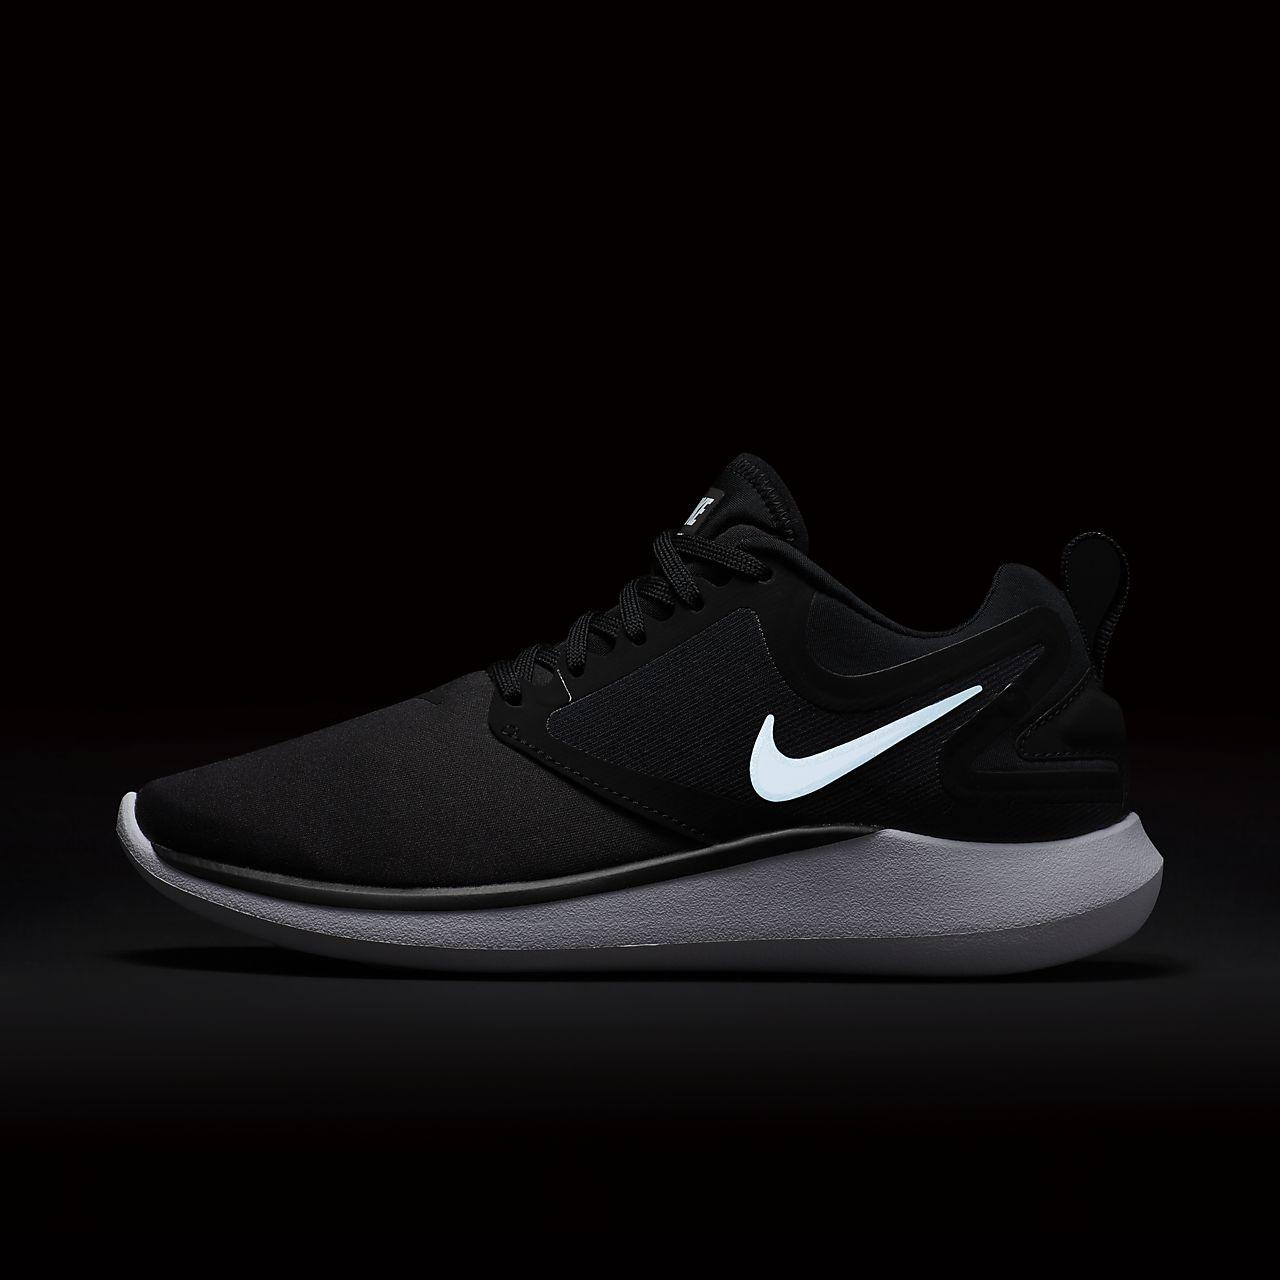 new product 851c4 d0240 Nike Lunarsolo, Chaussures de Running Homme, Noir (Black Black Anthracite